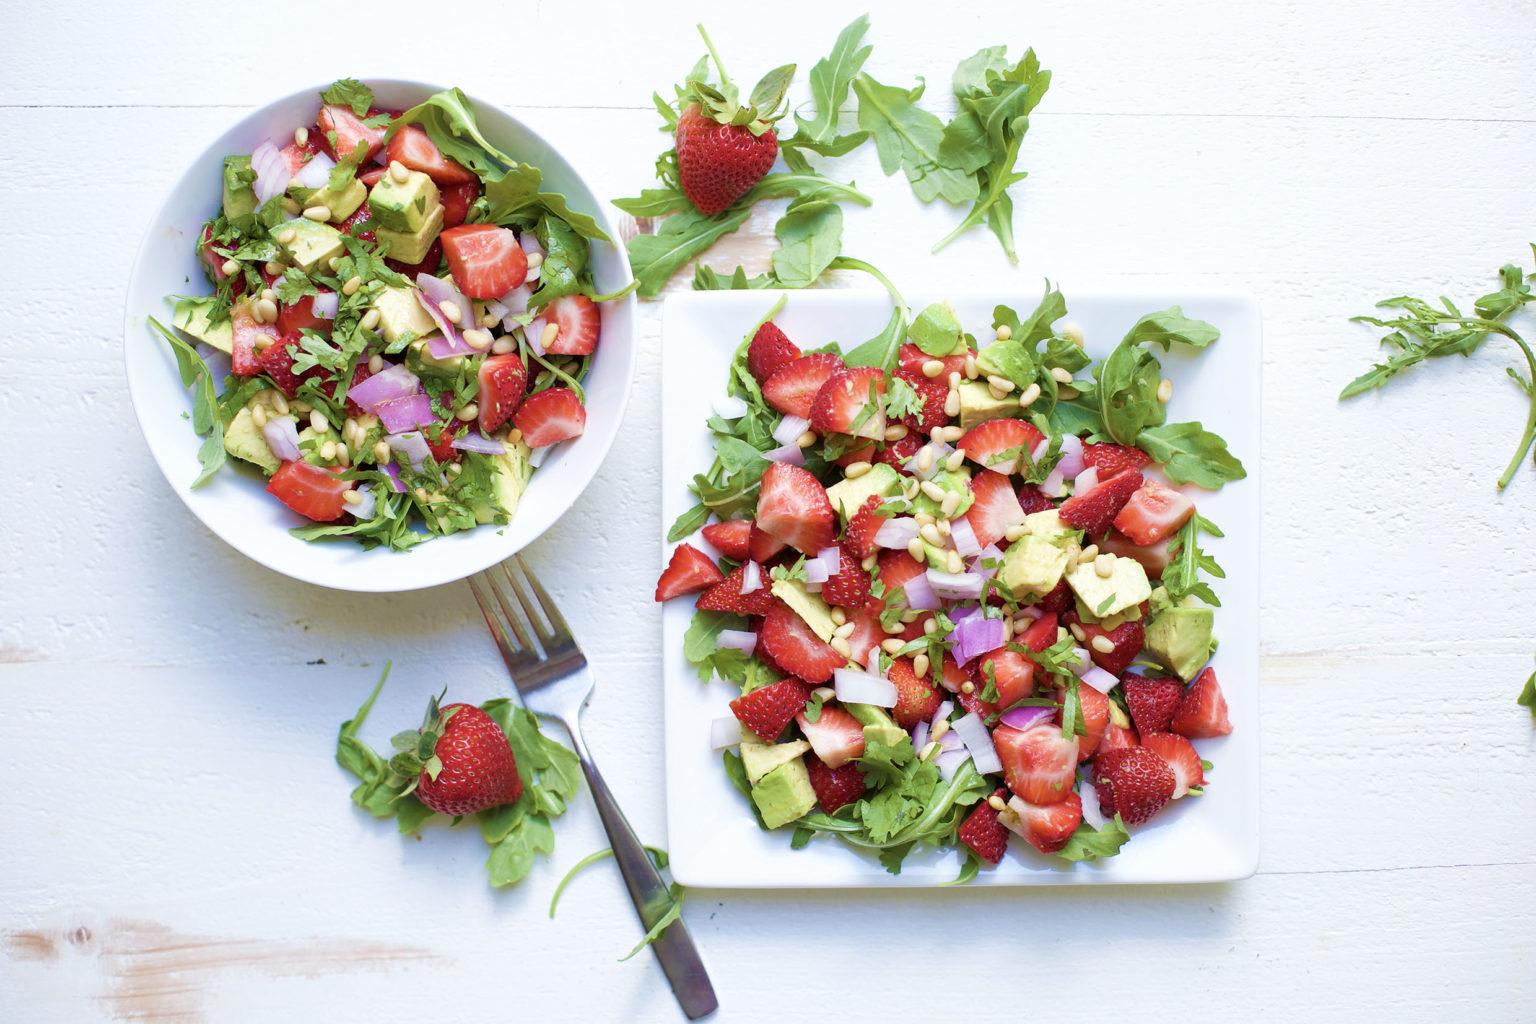 Avocado and strawberry salad